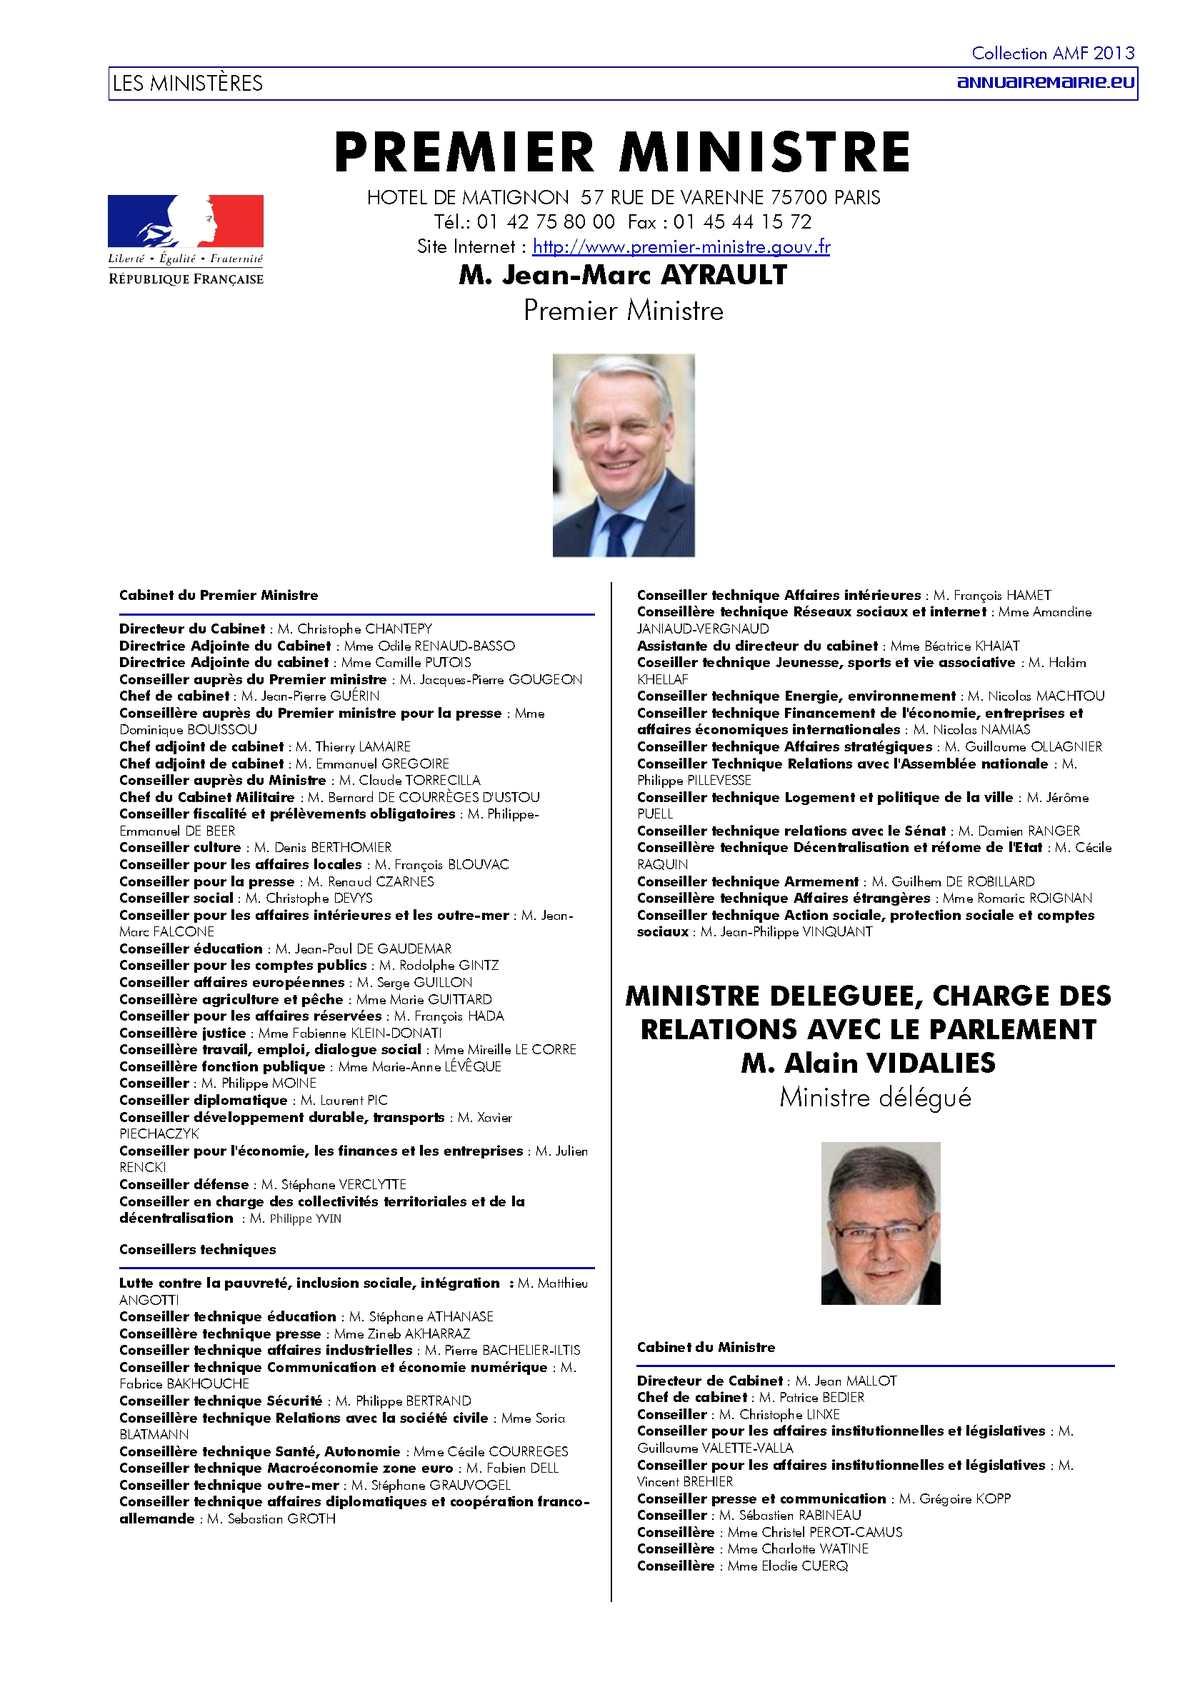 fabrice guyon attaché parlementaire